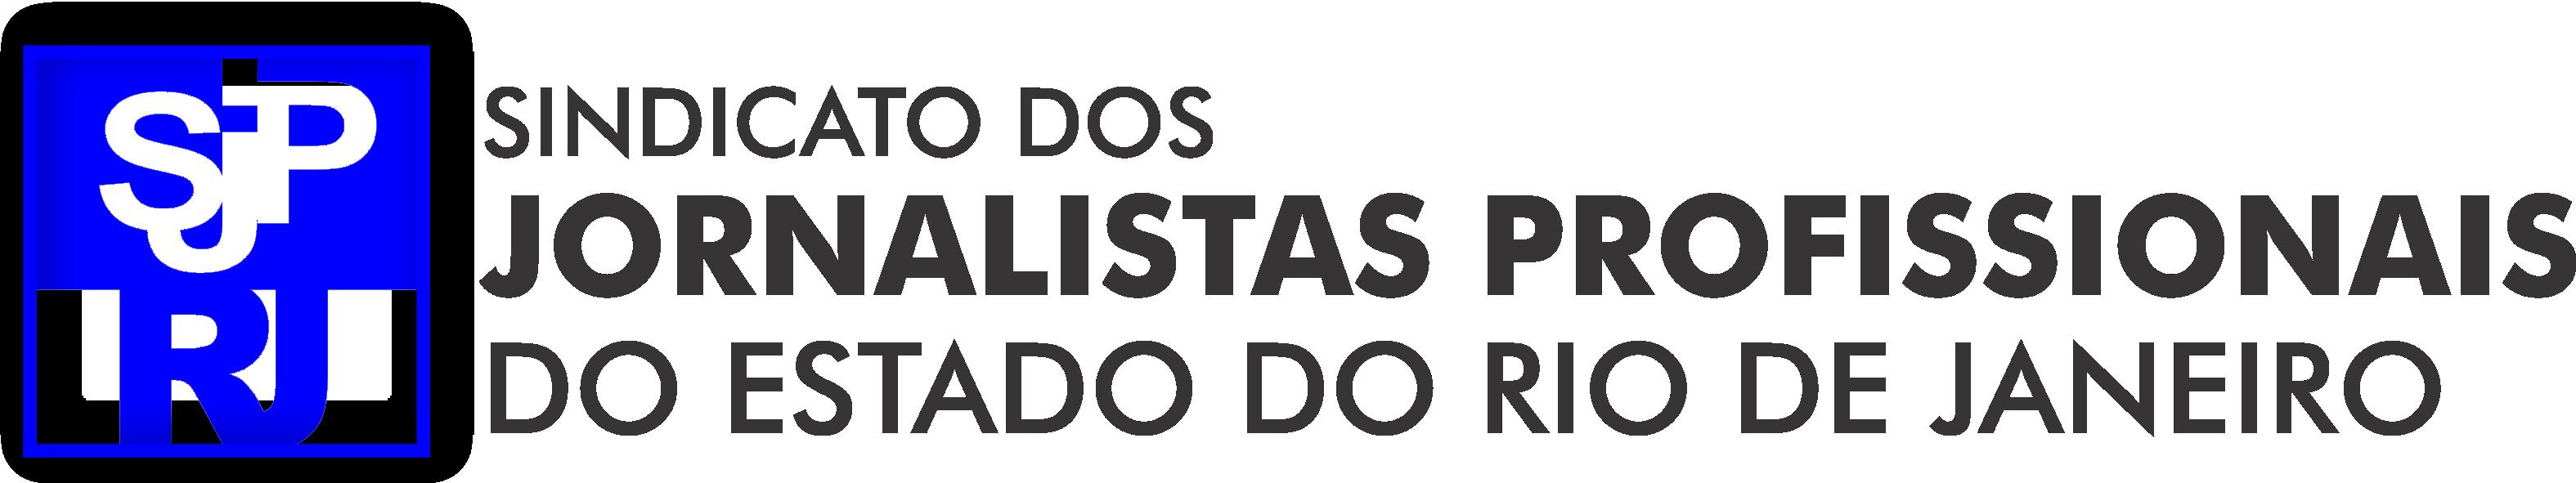 Sindicato dos Jornalistas RJ